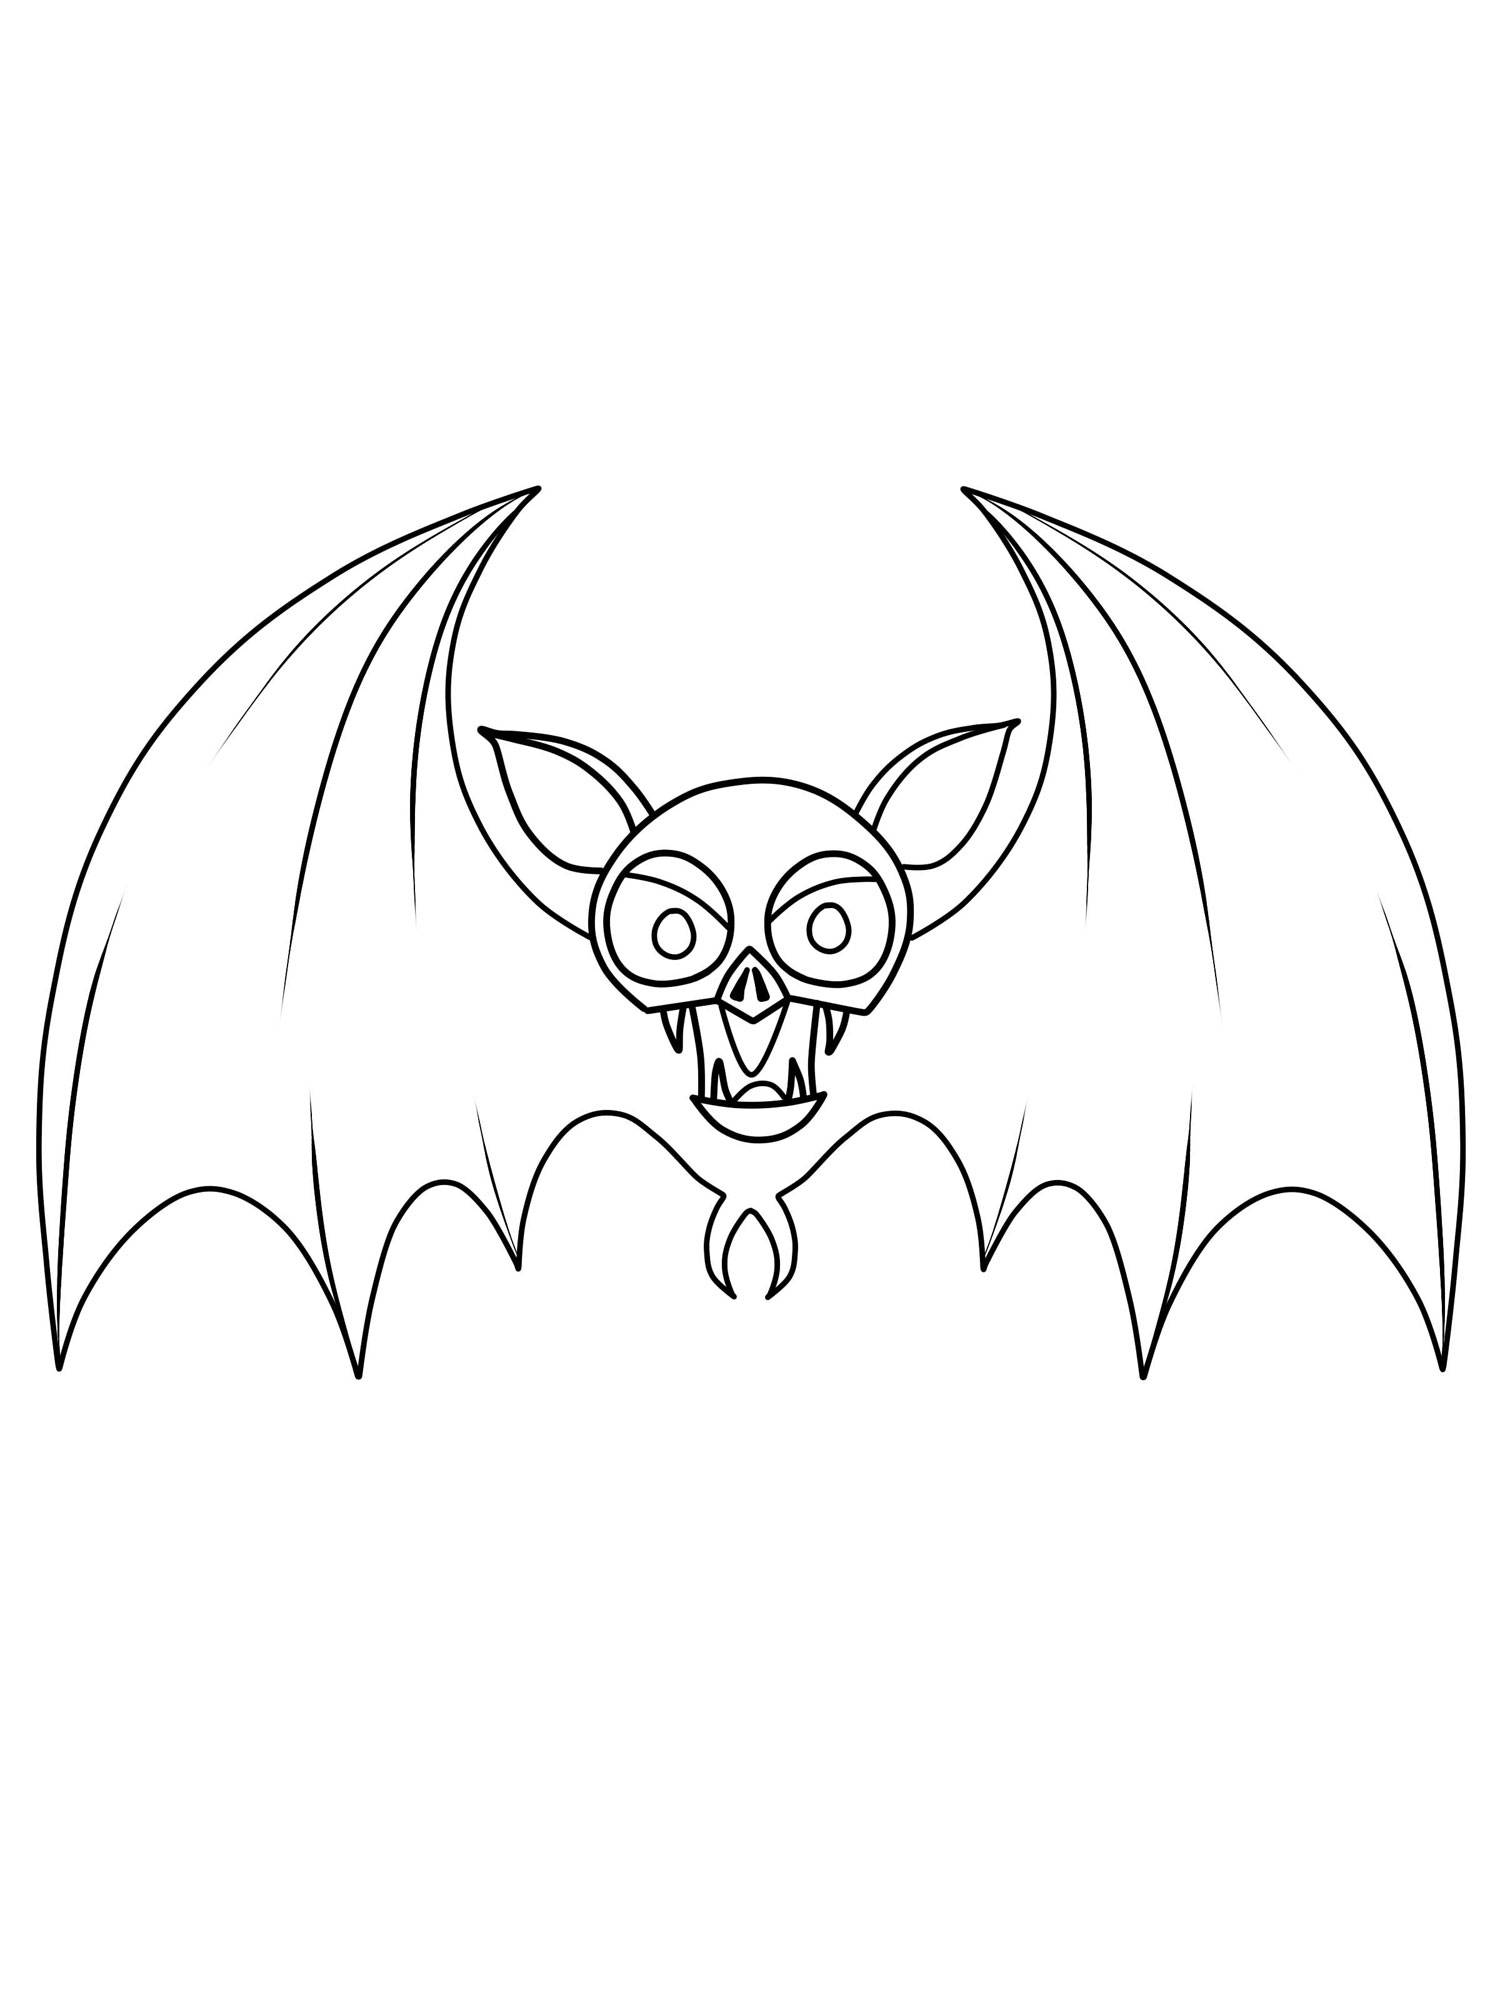 Ausmalbild Halloween: Fledermaus kostenlos ausdrucken